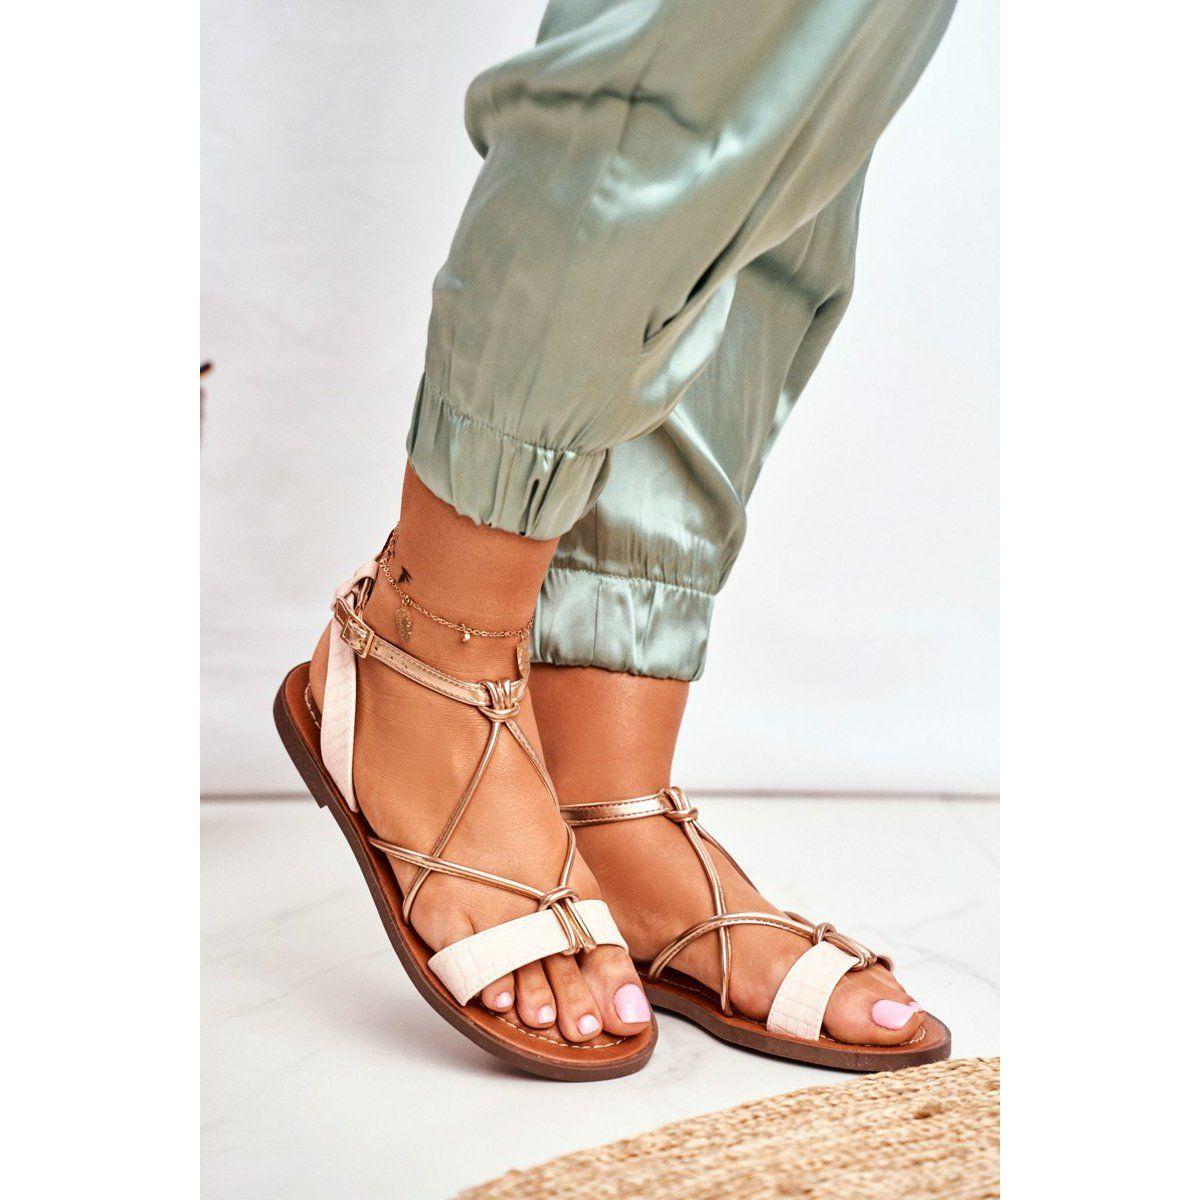 Ady Sandaly Damskie Plaskie Rozowe Alison In 2020 Lace Up Shoes Fashion